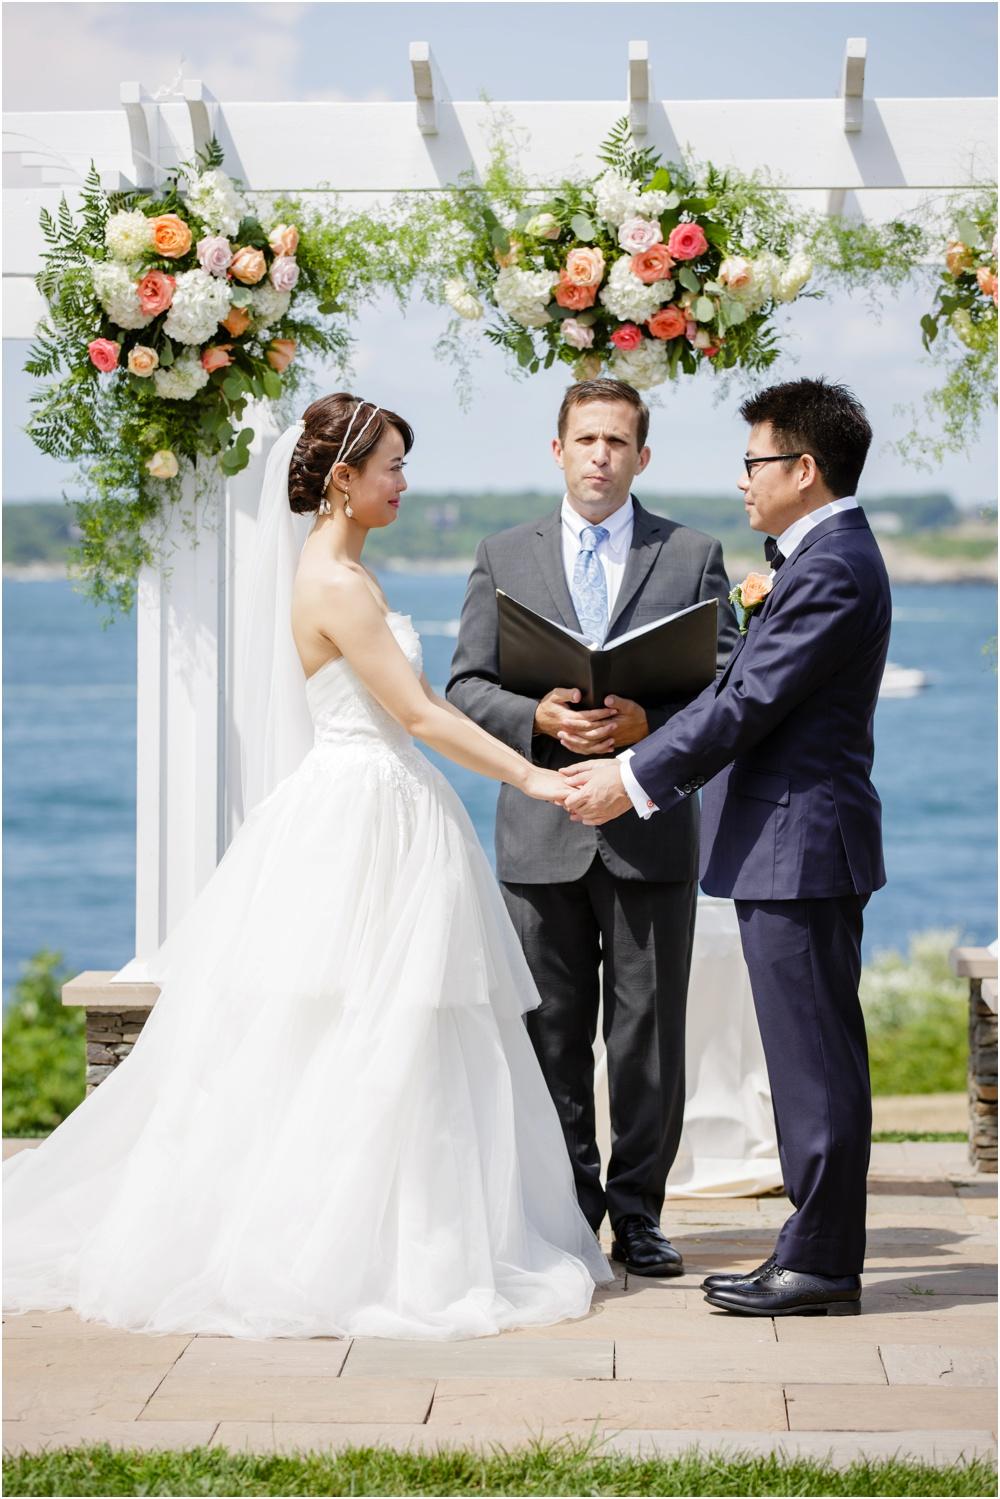 RI-Wedding-Photographer-Lefebvre-Photo-Blog_3208.jpg